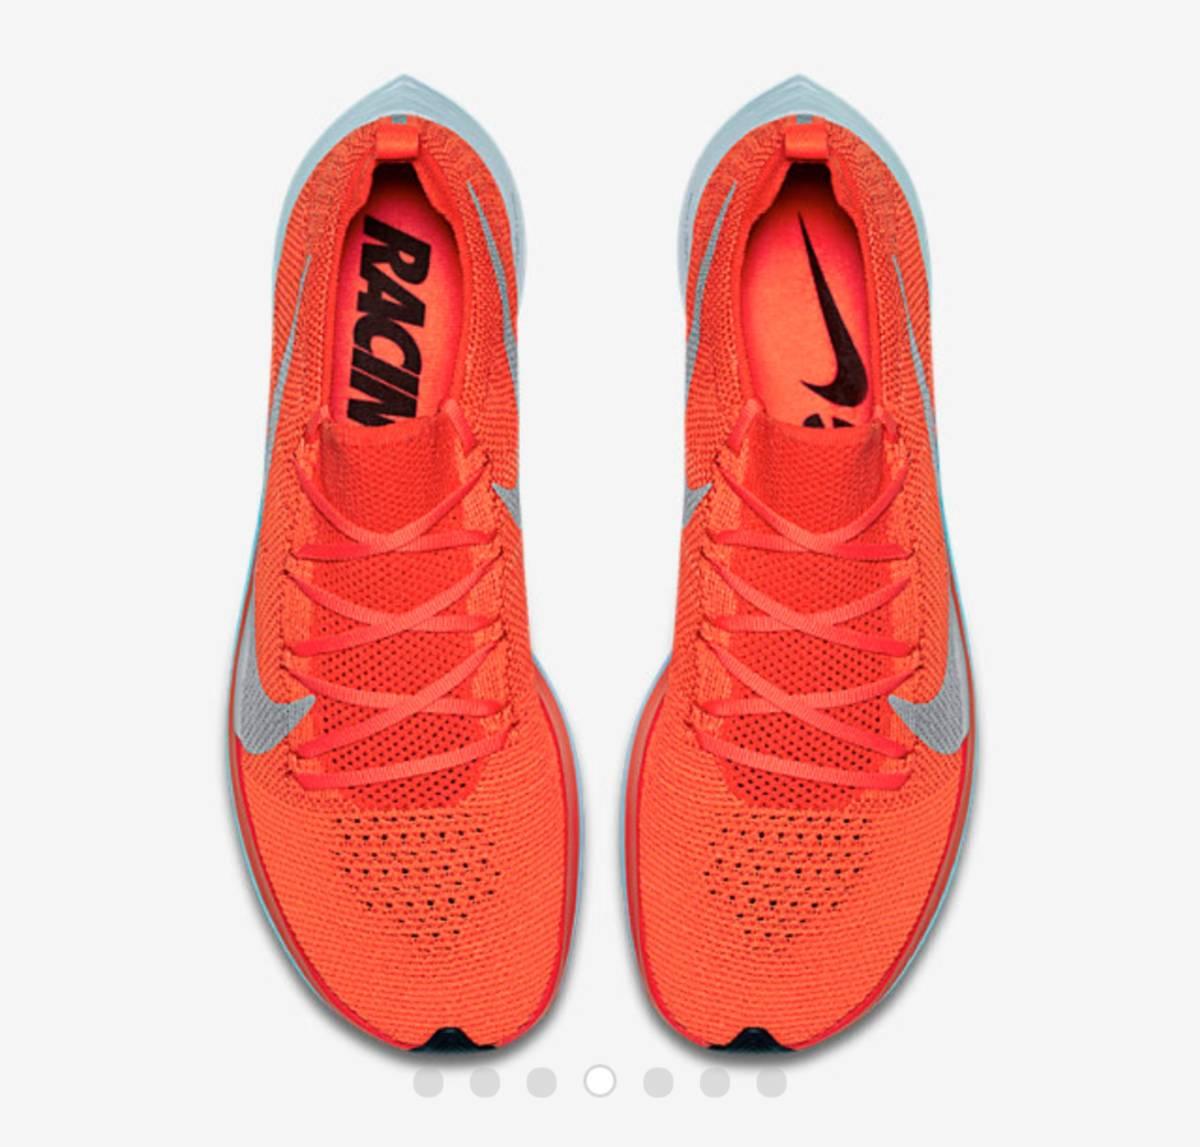 8858df5484 26cm Nike veipa- fly 4% fly knitted NIKE VAPORFLY 4% FLYKNIT orange ...